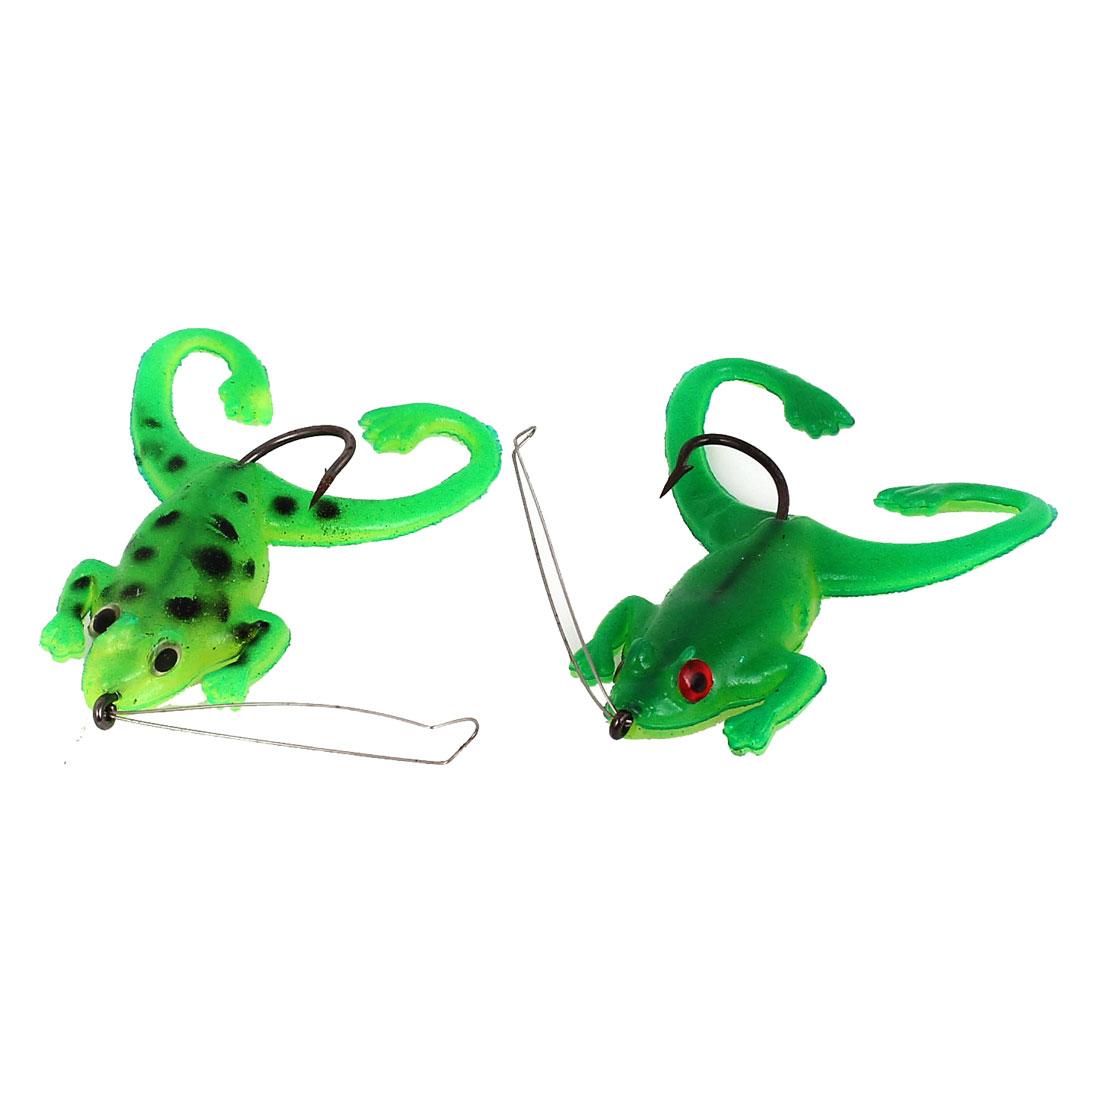 2pcs Green Black Silicone Simulation Frog Design Fishing Angling Hooks Bait Lure